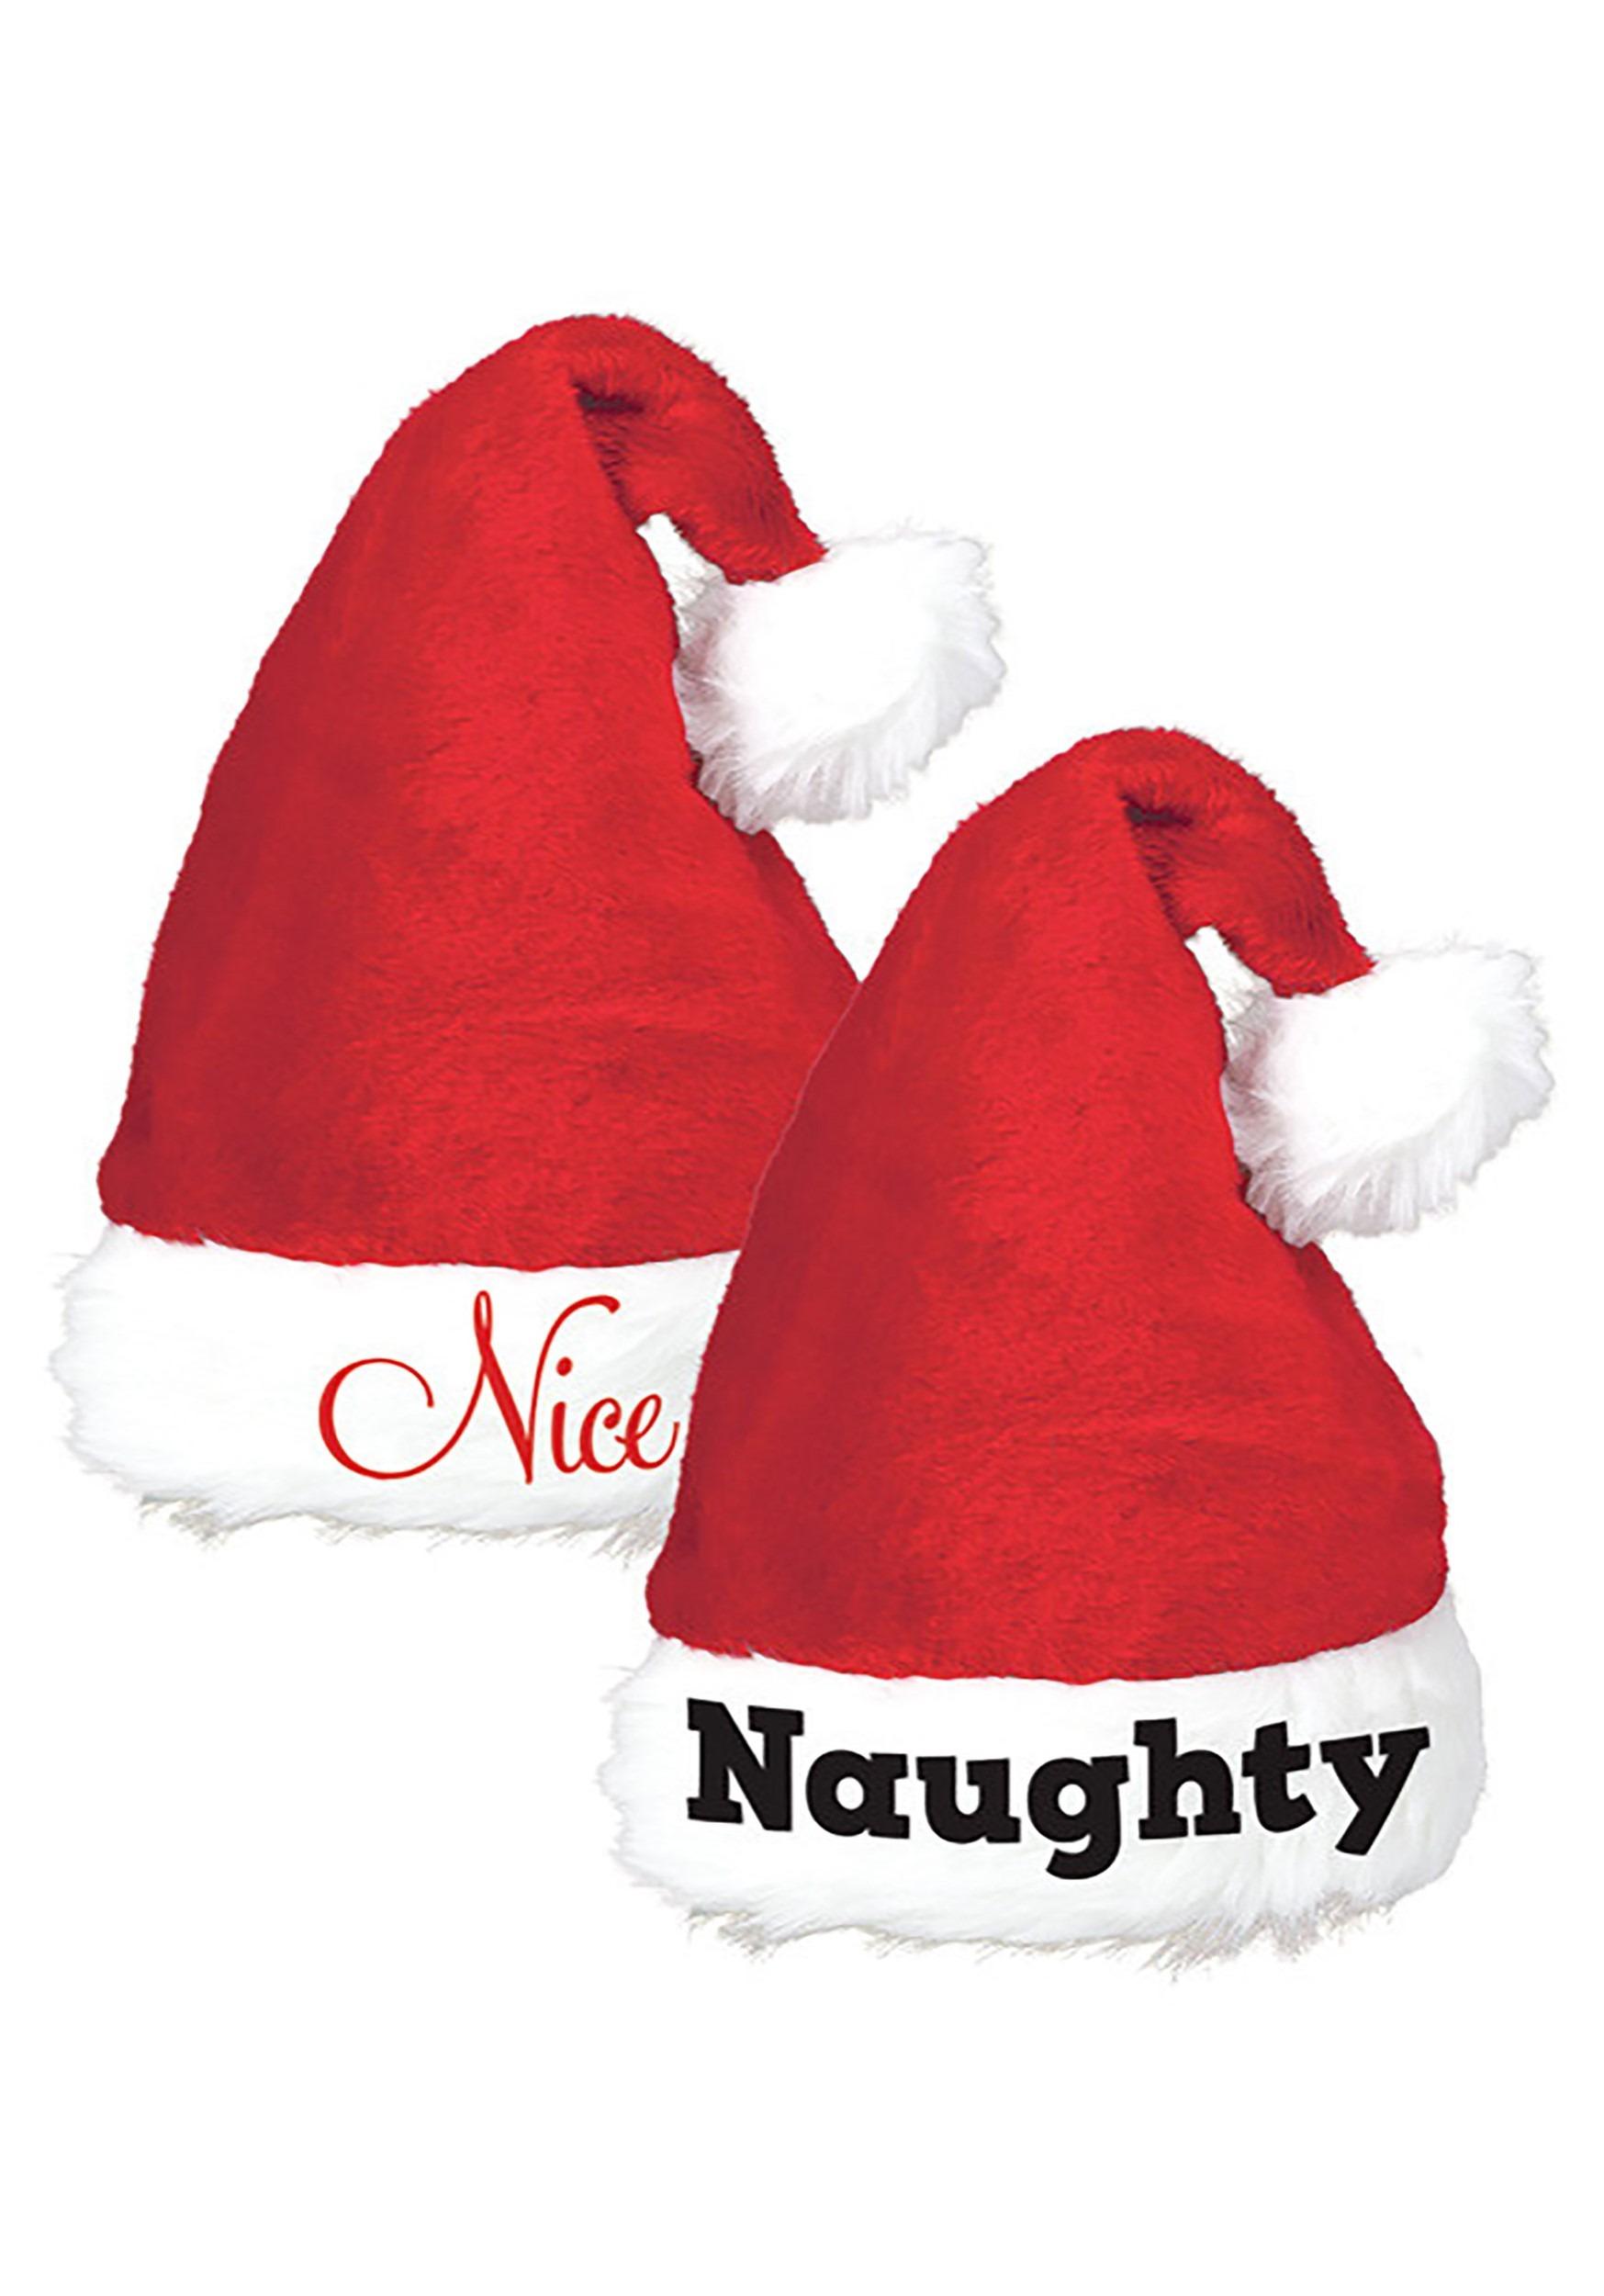 Set_of_Two-_Naughty_and_Nice_Santa_Hats